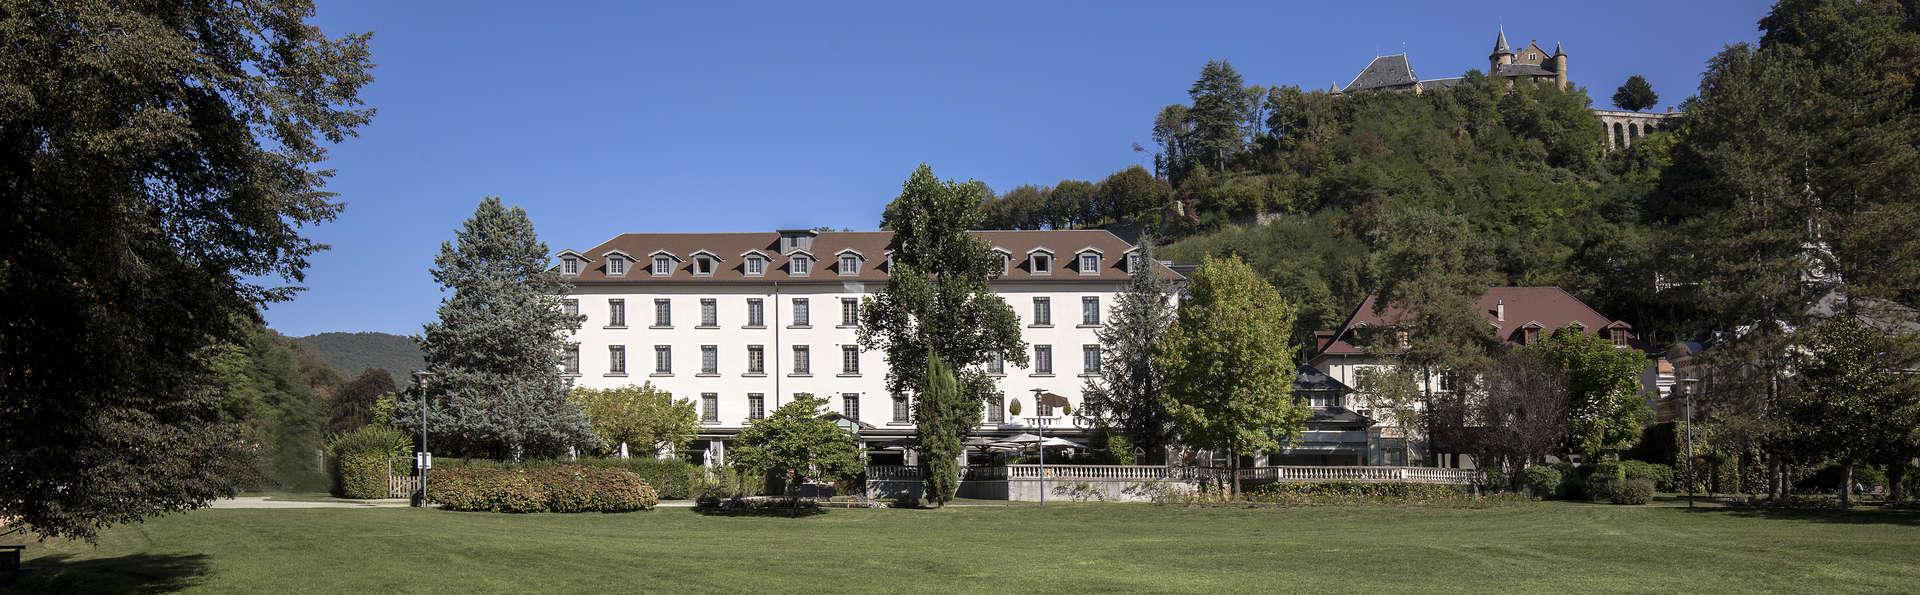 Grand h tel les terrasses d 39 uriage hotel uriage - Les terrasses d uriage ...